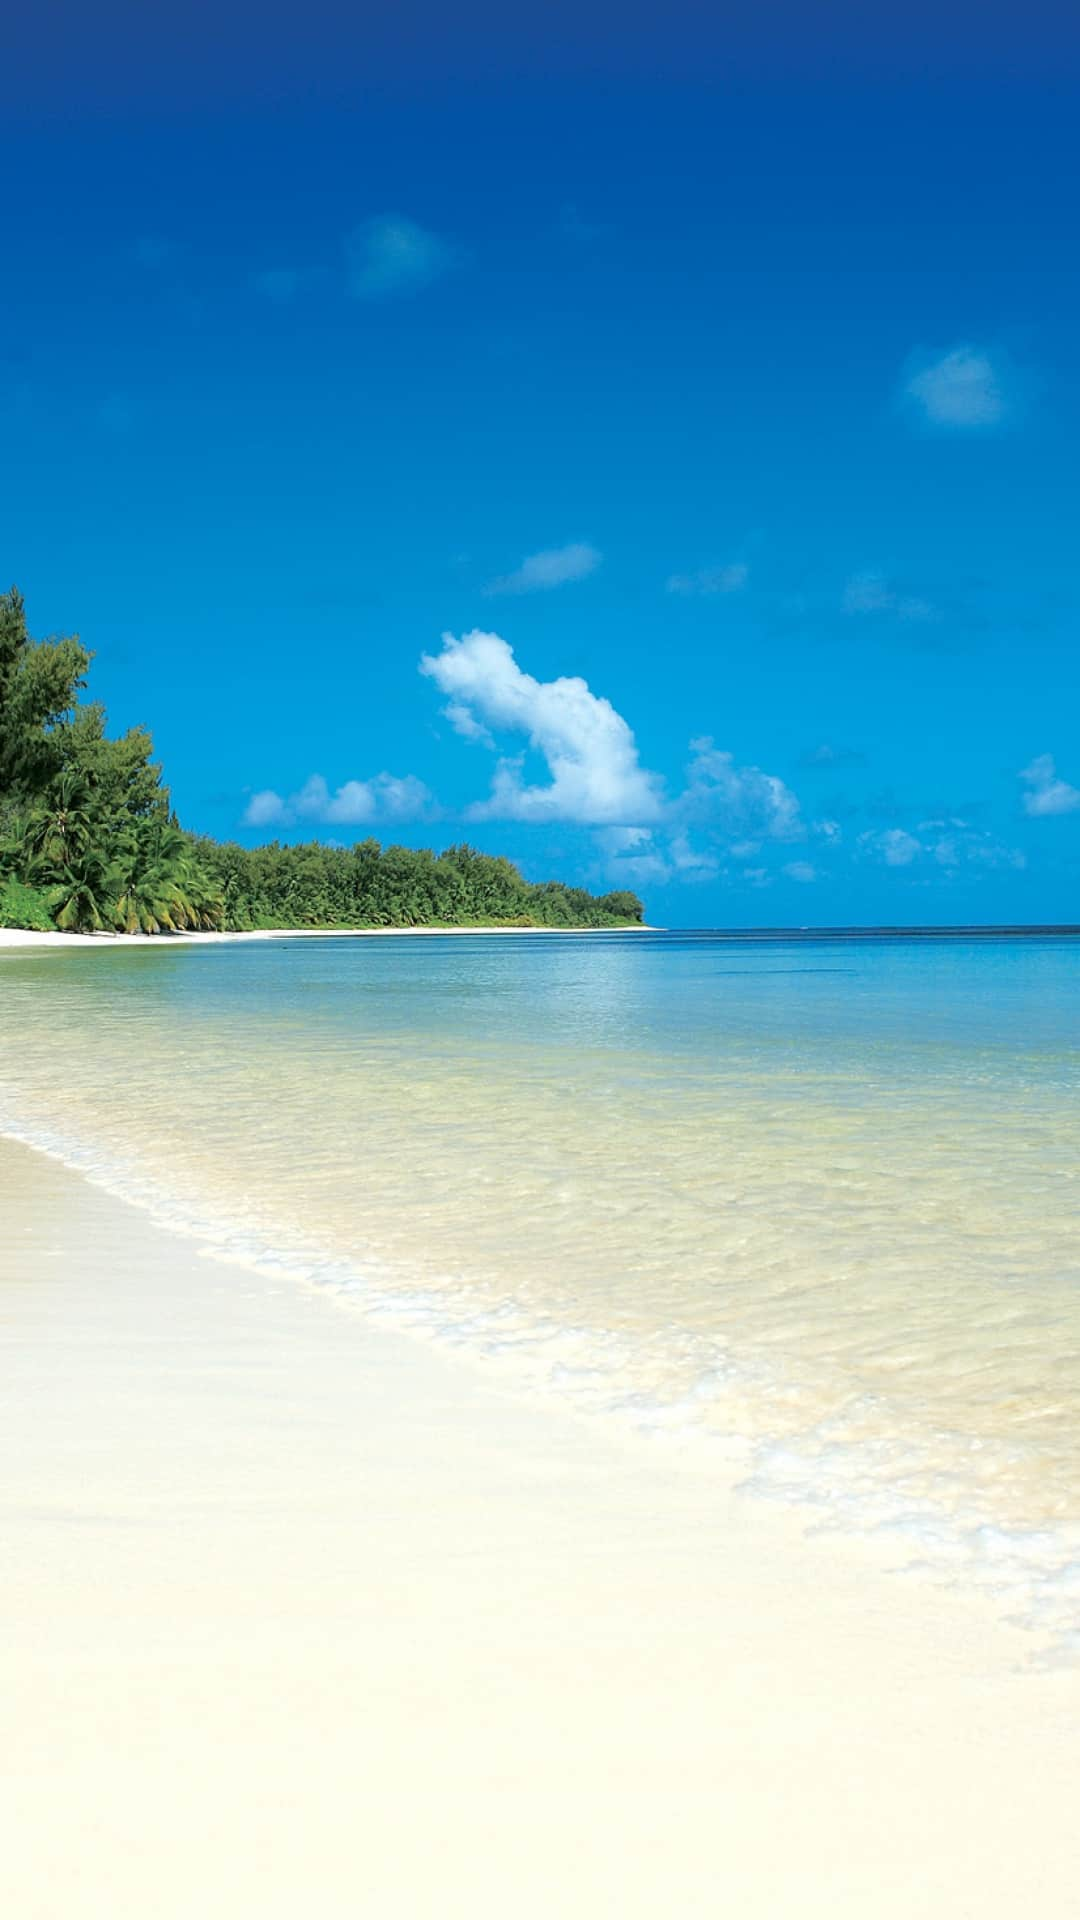 white-sand-tropical-island-beach-android-wallpaper